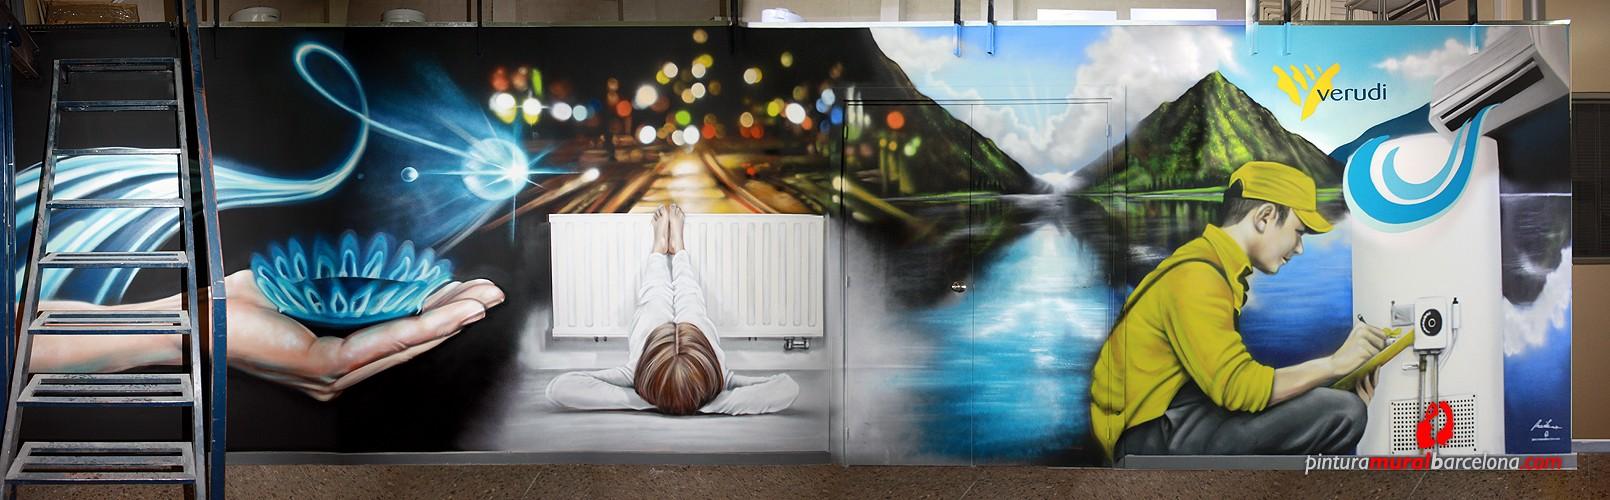 mural-graffiti-realismo-gas-calefaccion-paisaje